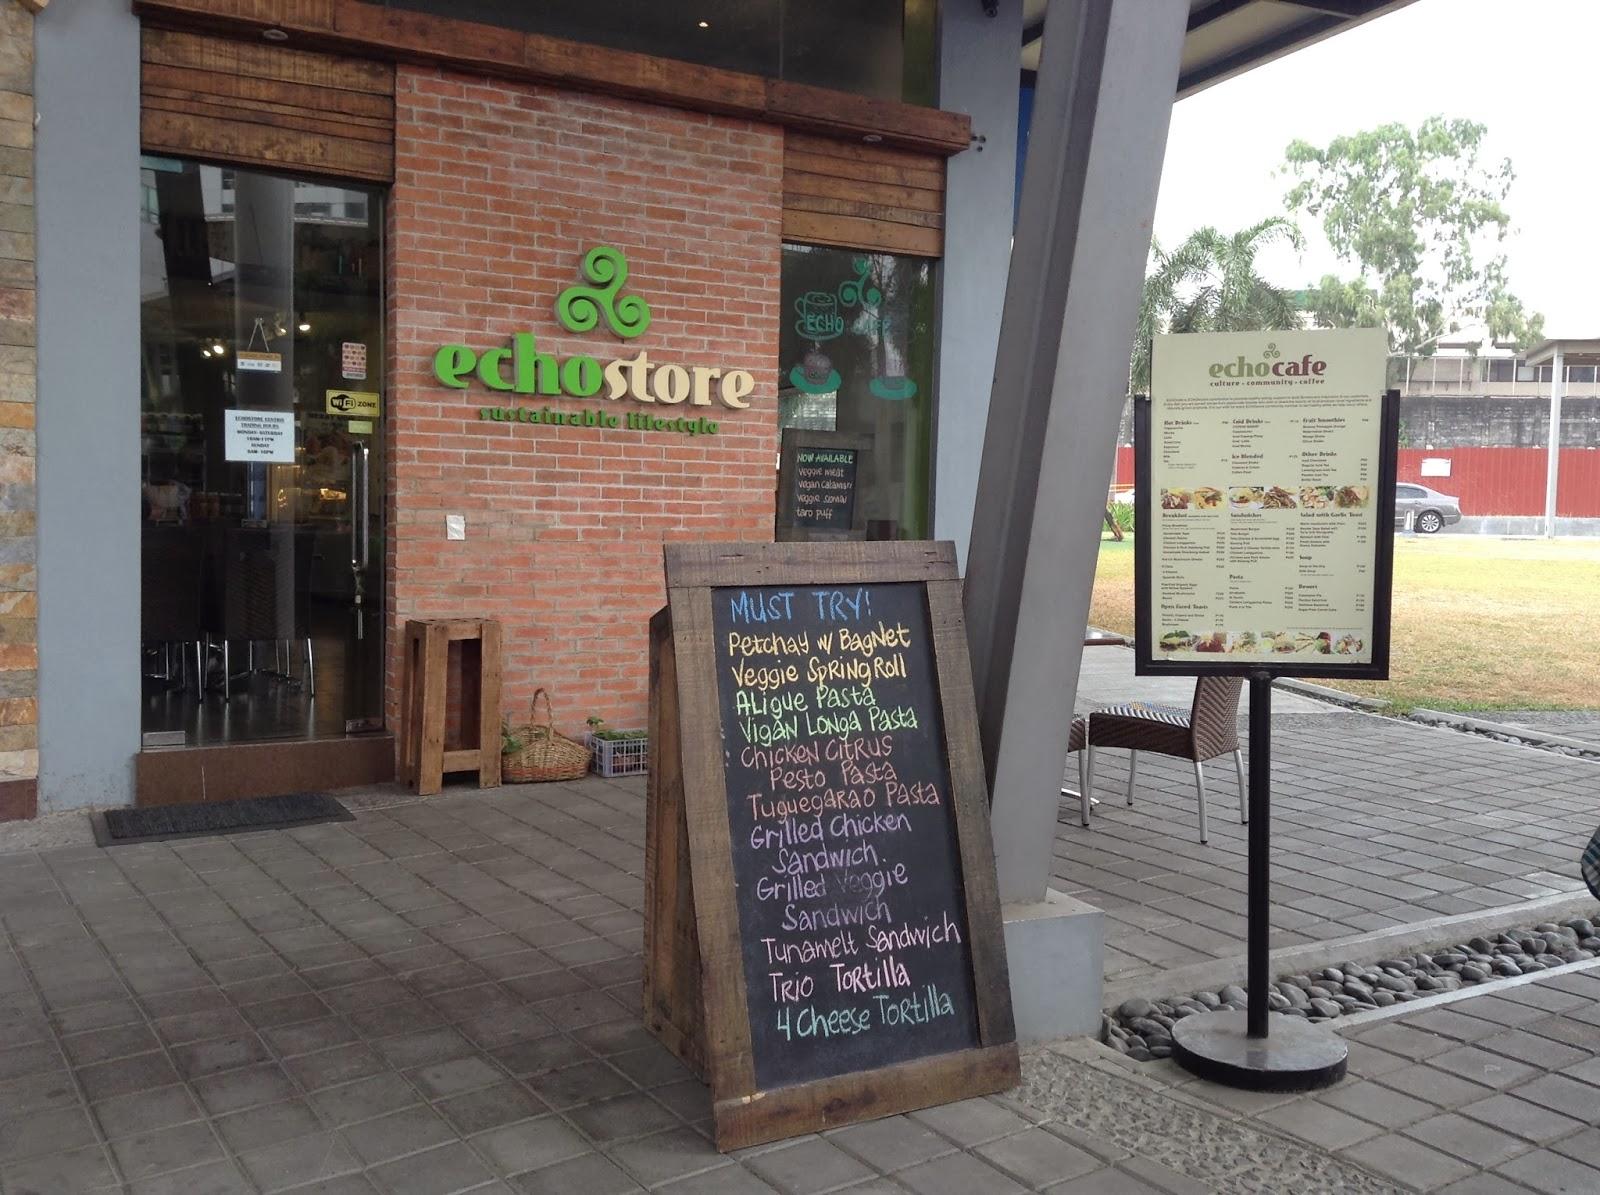 Ecostore's echocafe at Centris walk